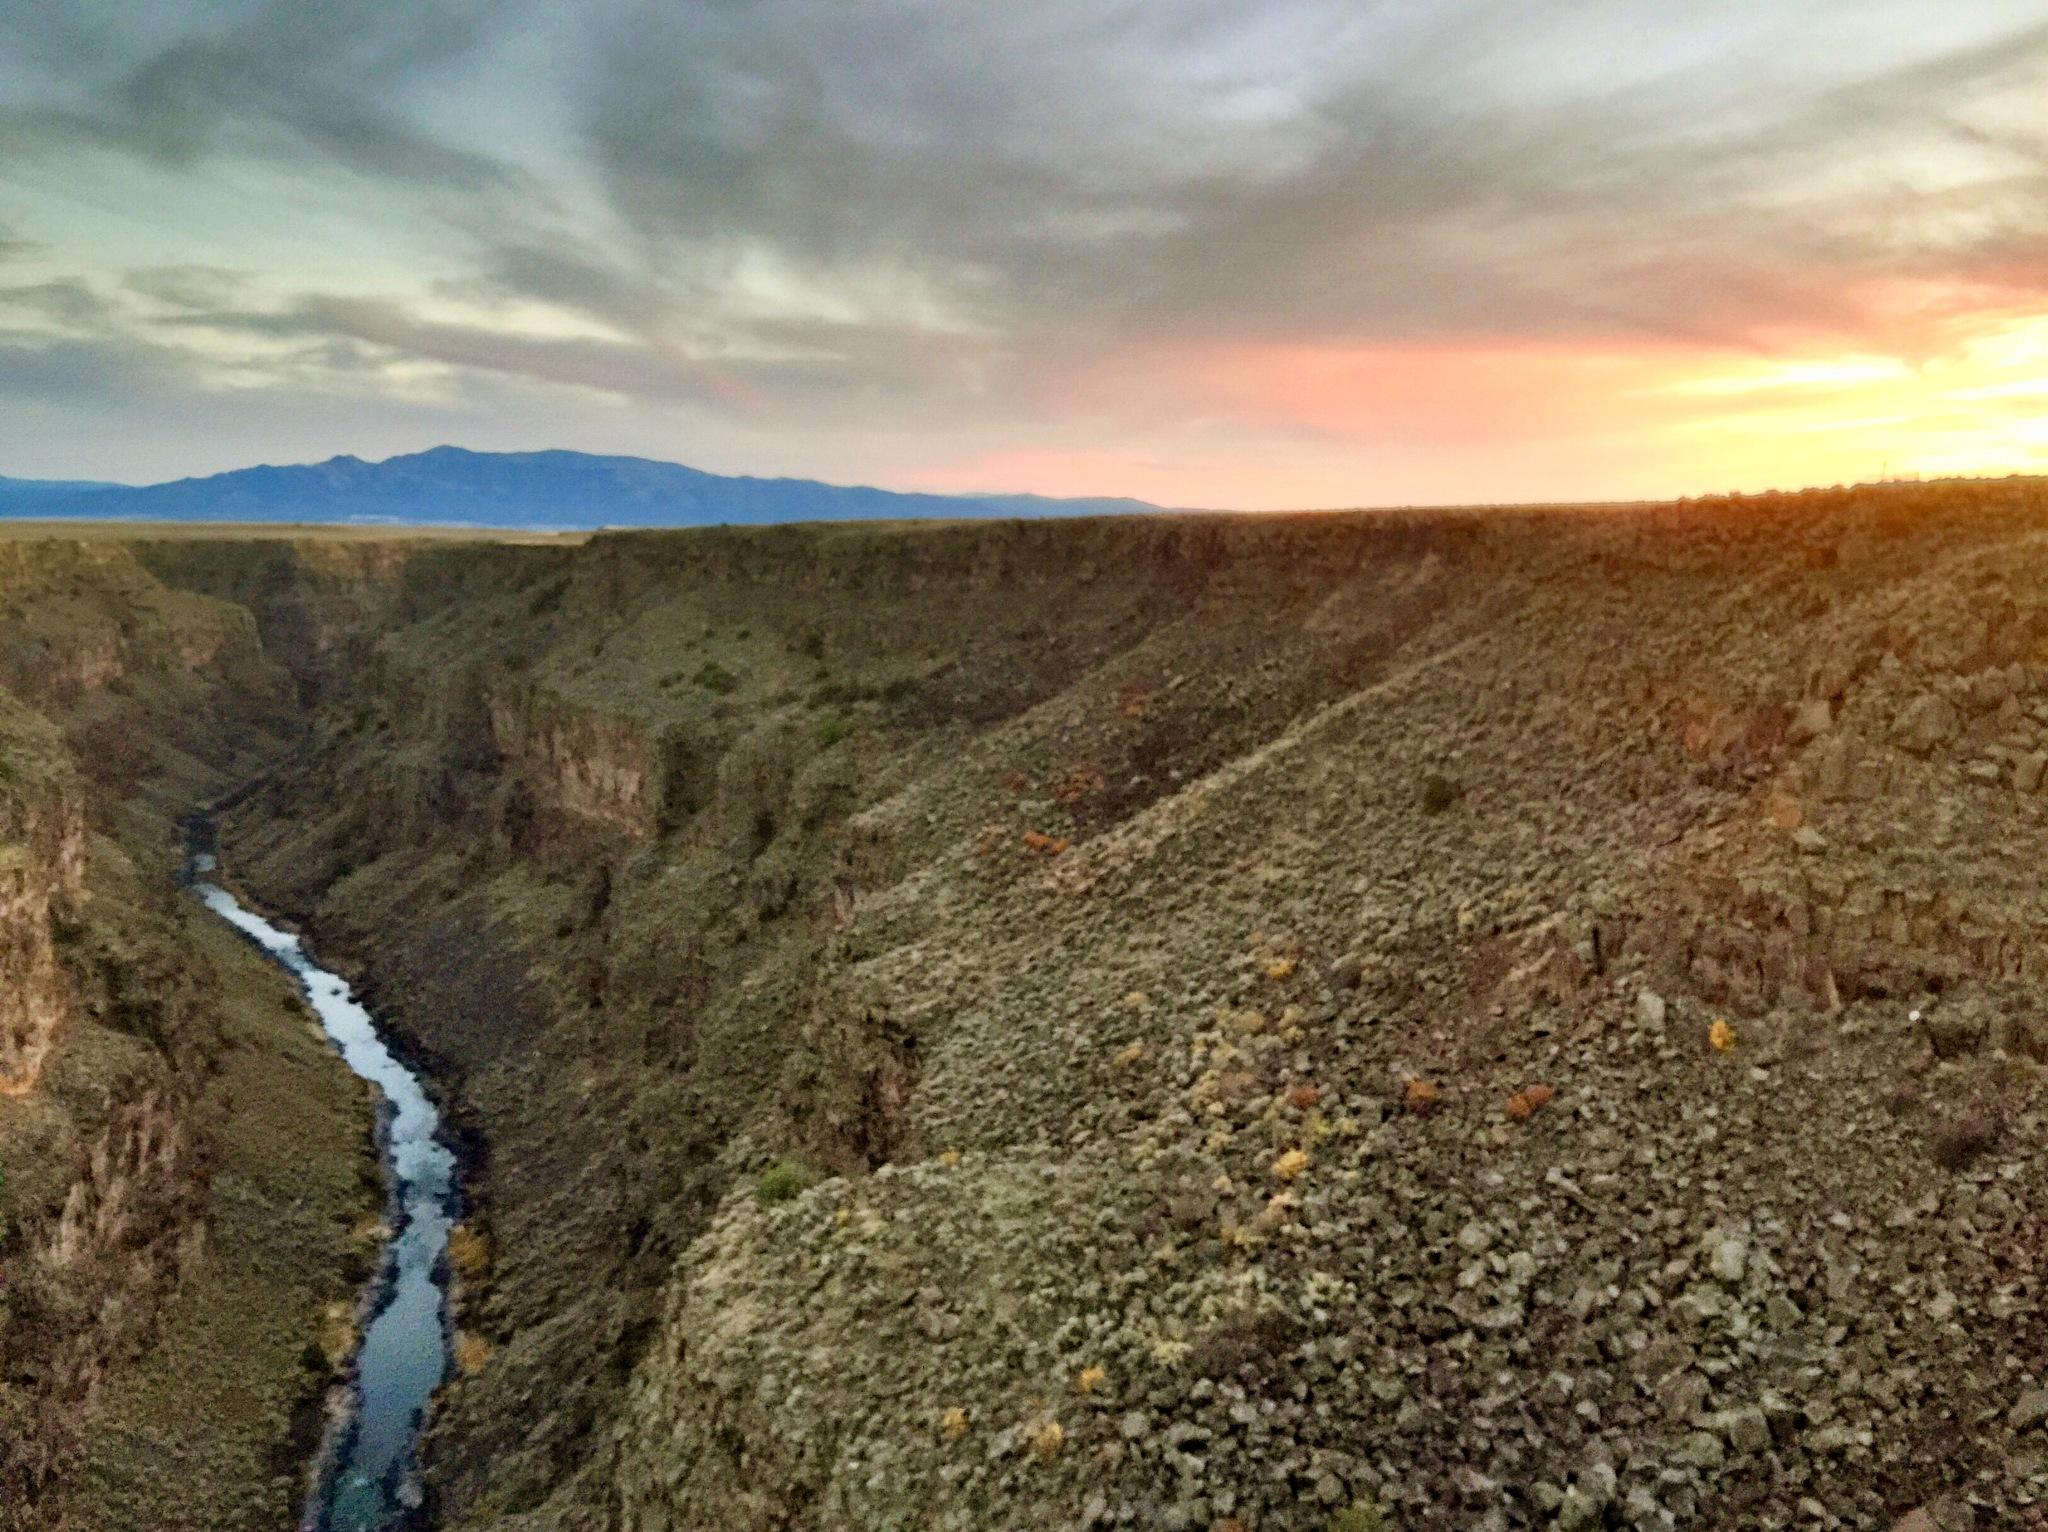 Rio Grande gorge bridge sunset by emsphotonut41